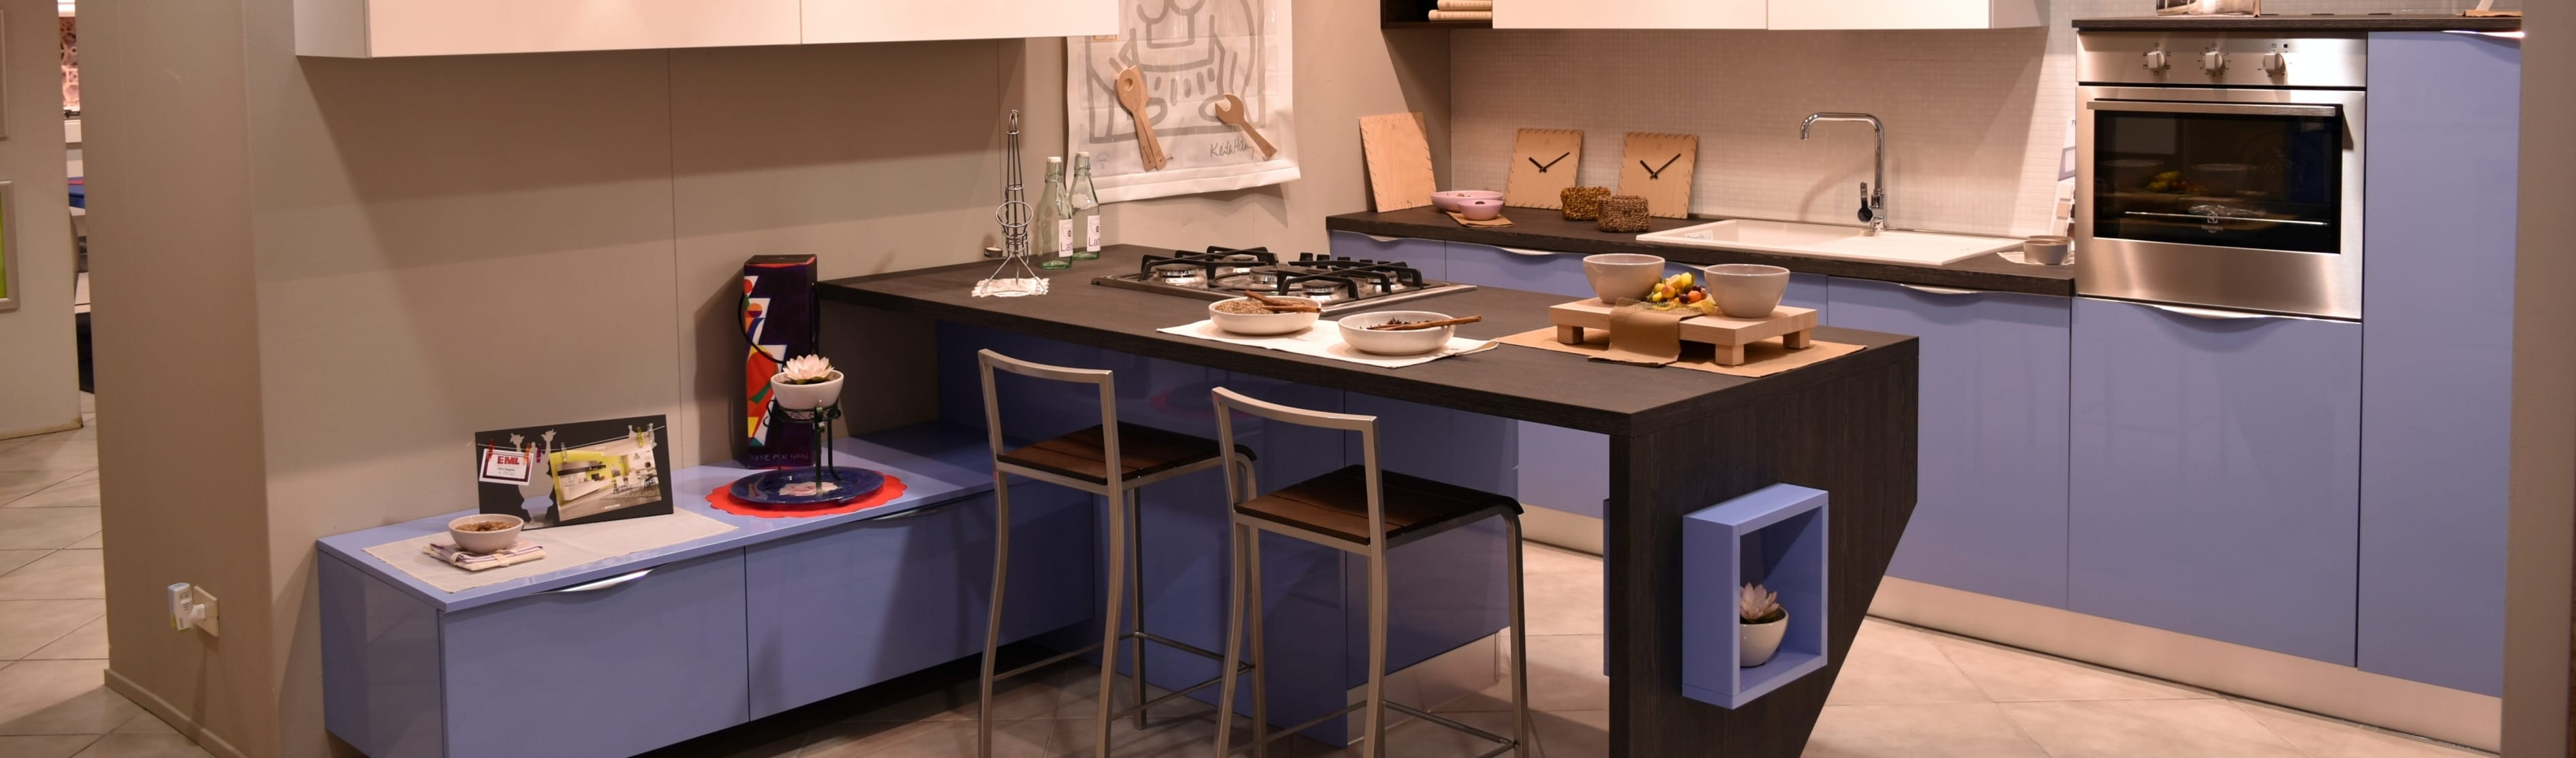 Cucina BERLONI mod. B50 Gola Cava di EML SRL | homify